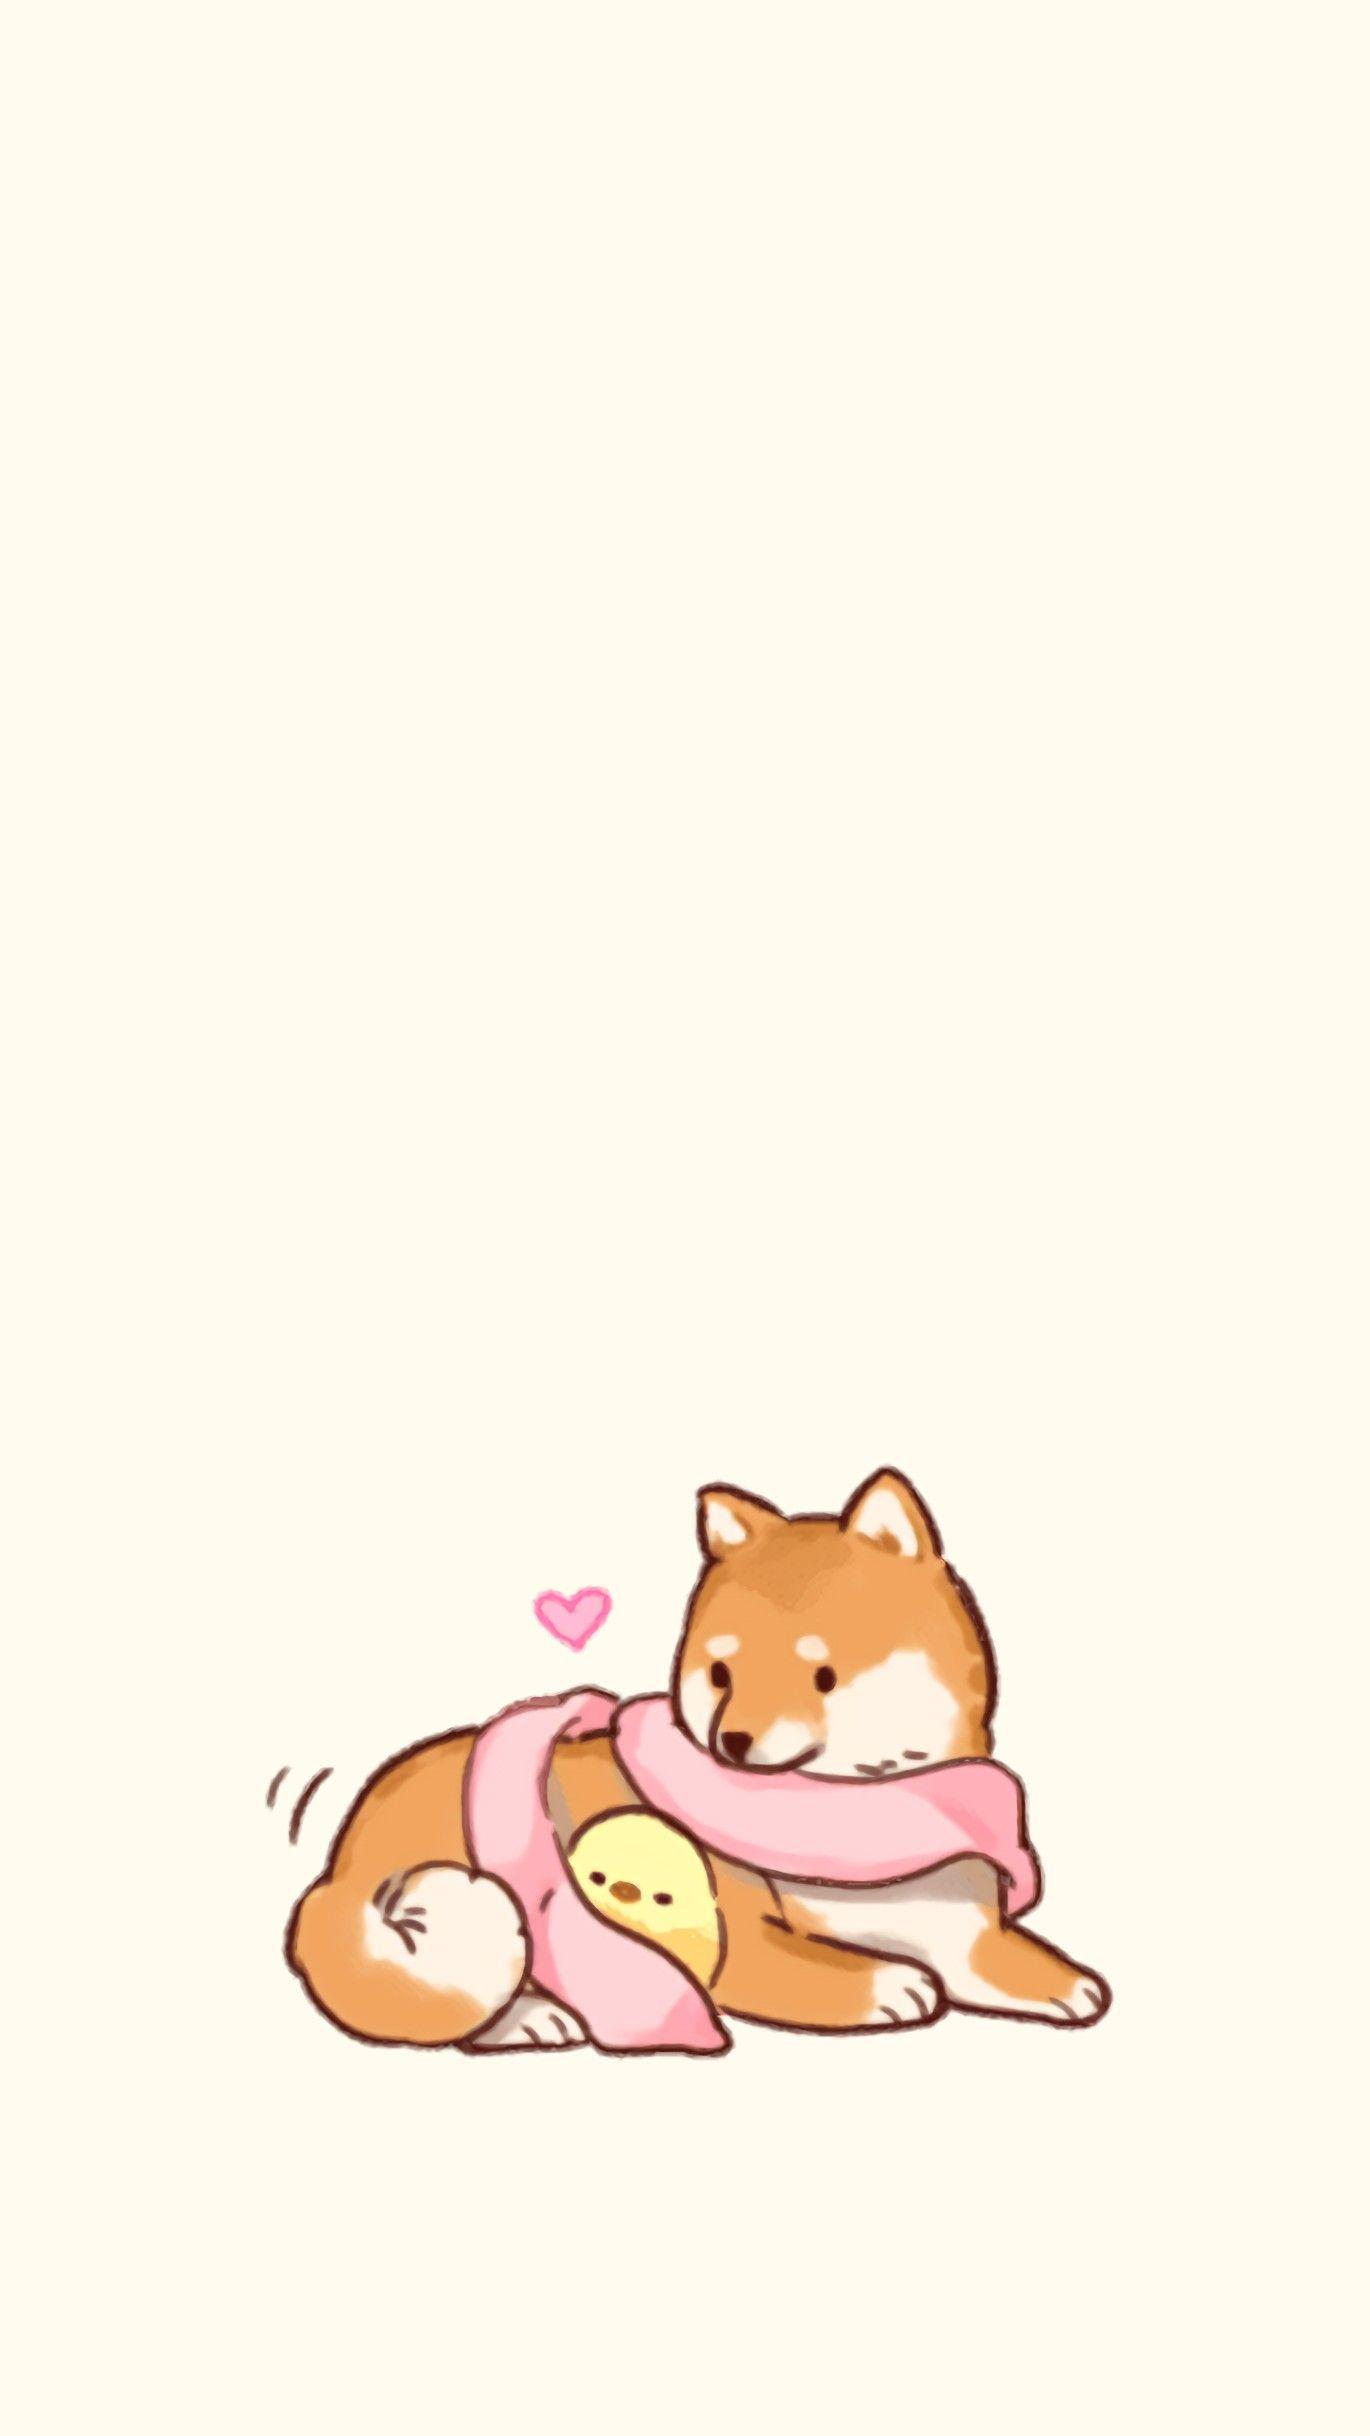 Cuddly Cute Cartoon Wallpapers Cute Kawaii Animals Kawaii Drawings